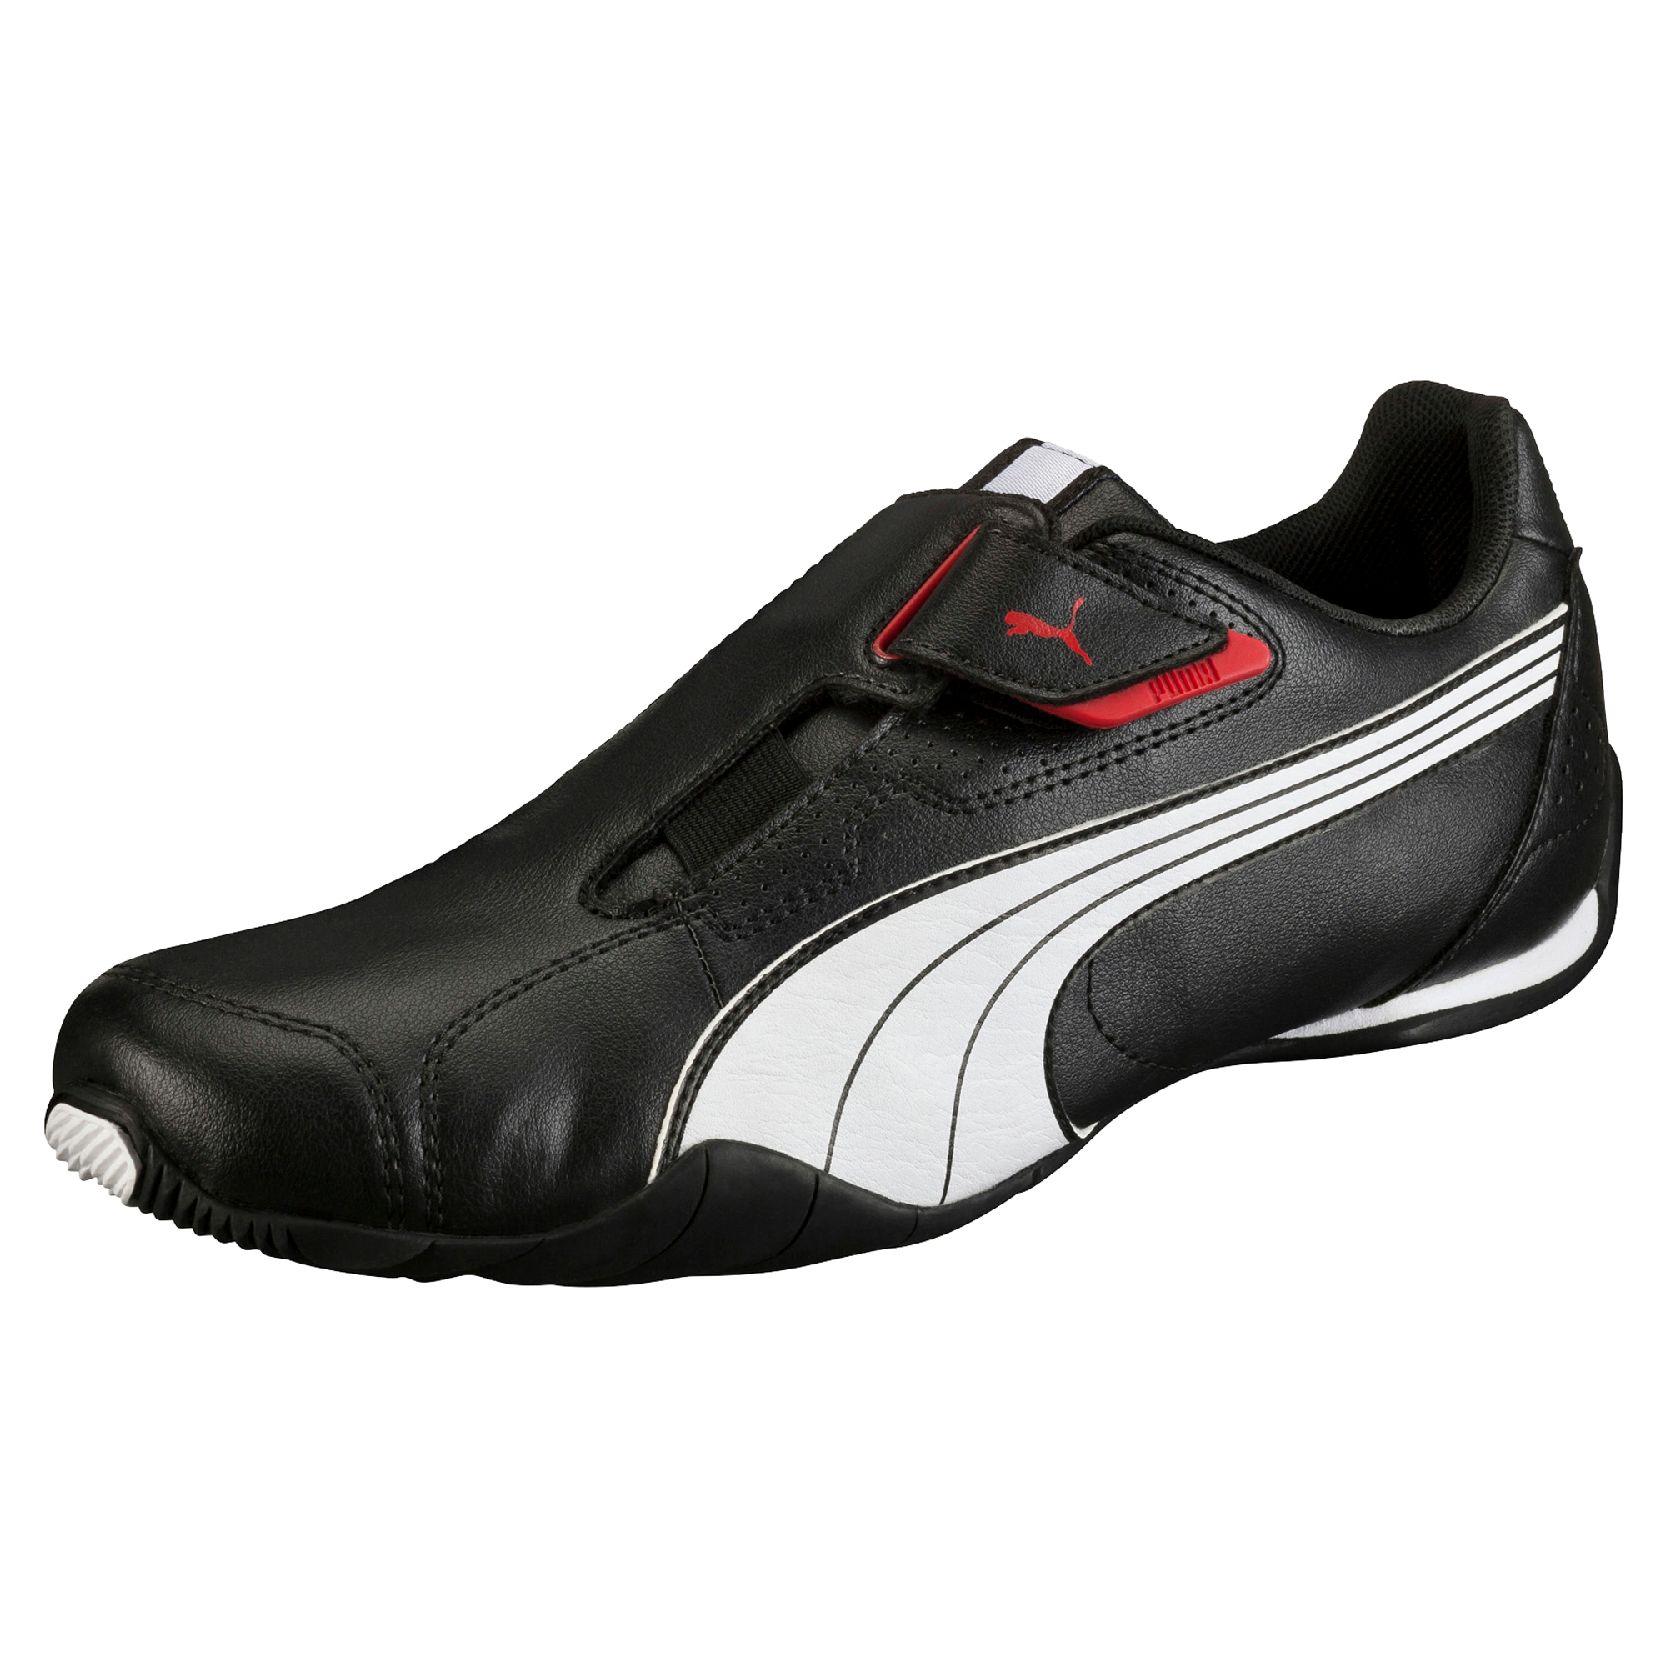 Puma Redon Move Sneaker Herren Schuhe 185999 black white high risk red 02